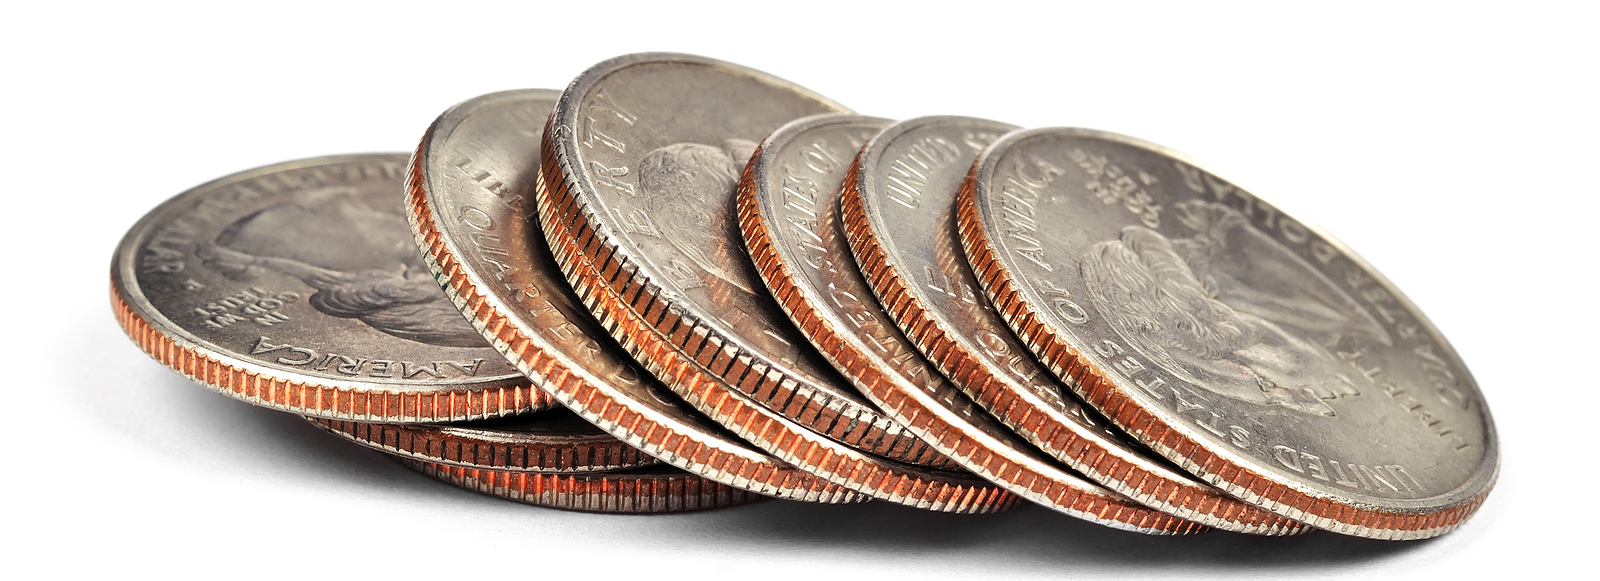 quarter-coins2.png